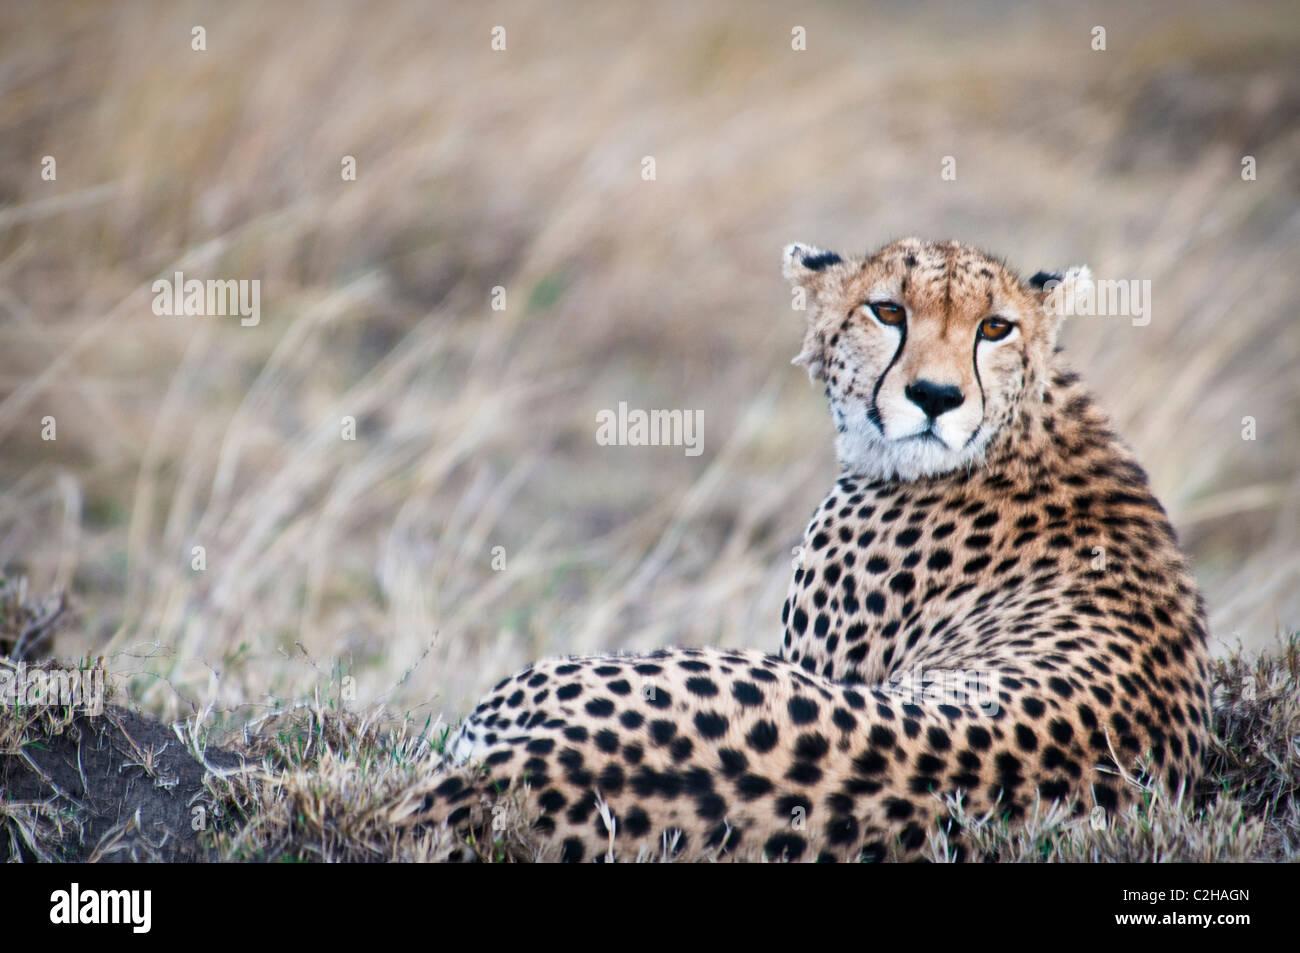 Gepard, Acinonyx Jubatus, Suche nach Beute, Masai Mara National Reserve, Kenia, Afrika Stockbild